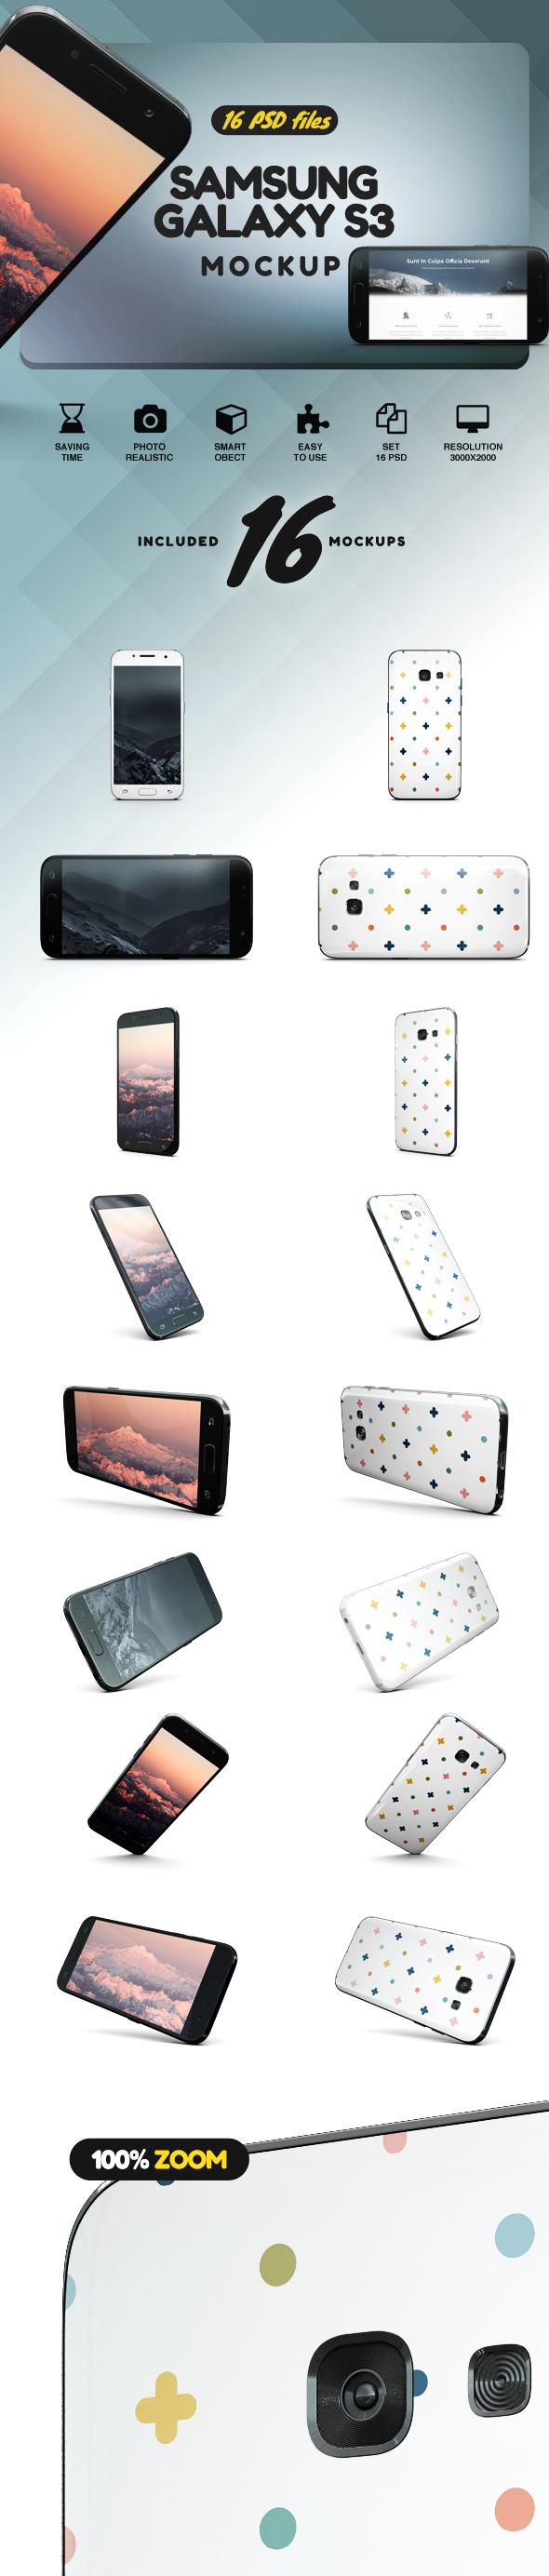 Samsung Galaxy s3 Mockup example image 2